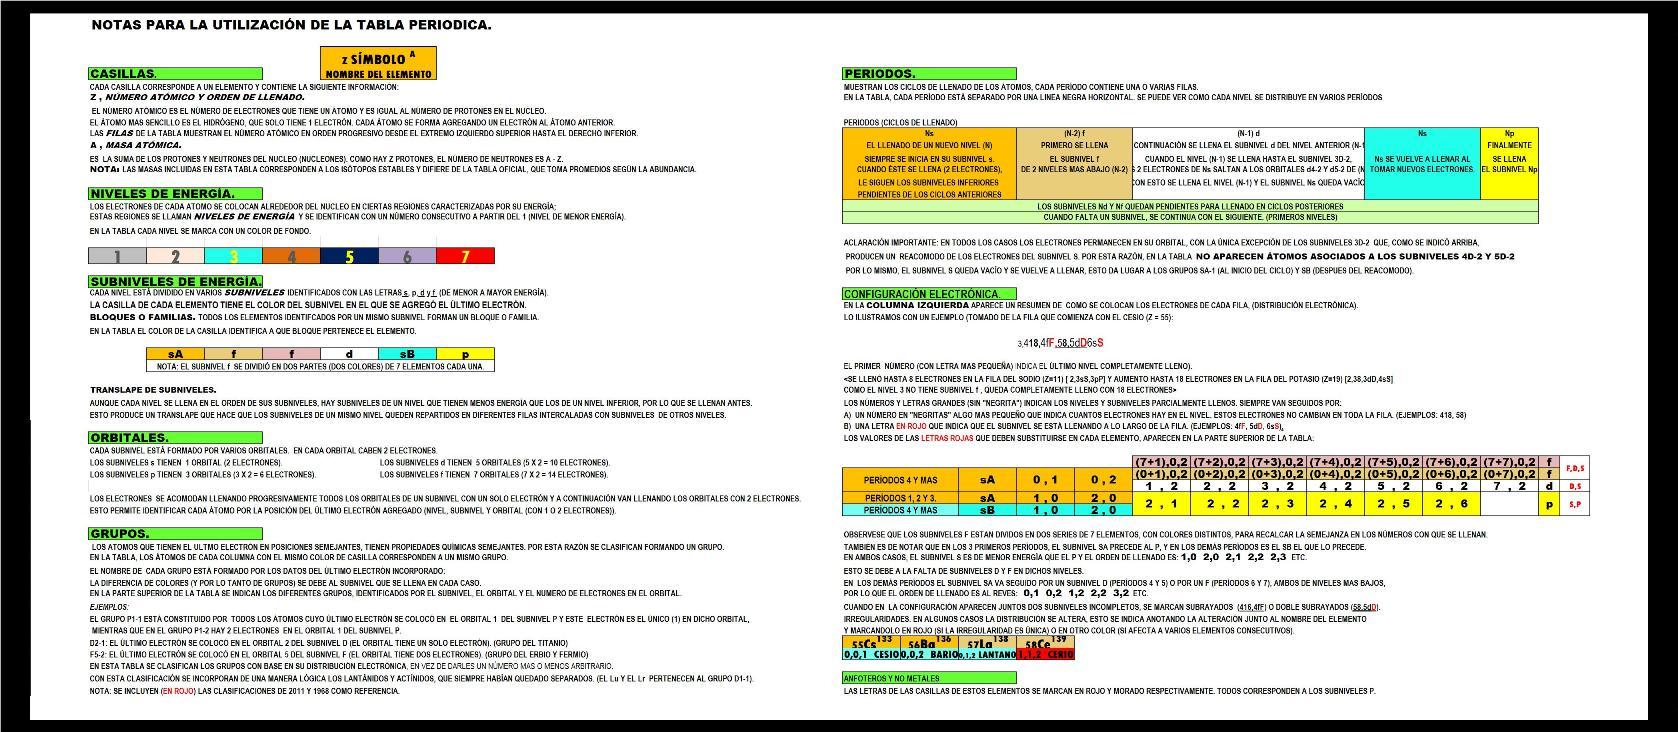 Tabla periodica de los elementos clasificada por niveles ciencia fisica quimica tablaperiodica science physics chemistry periodictable orbitals urtaz Images